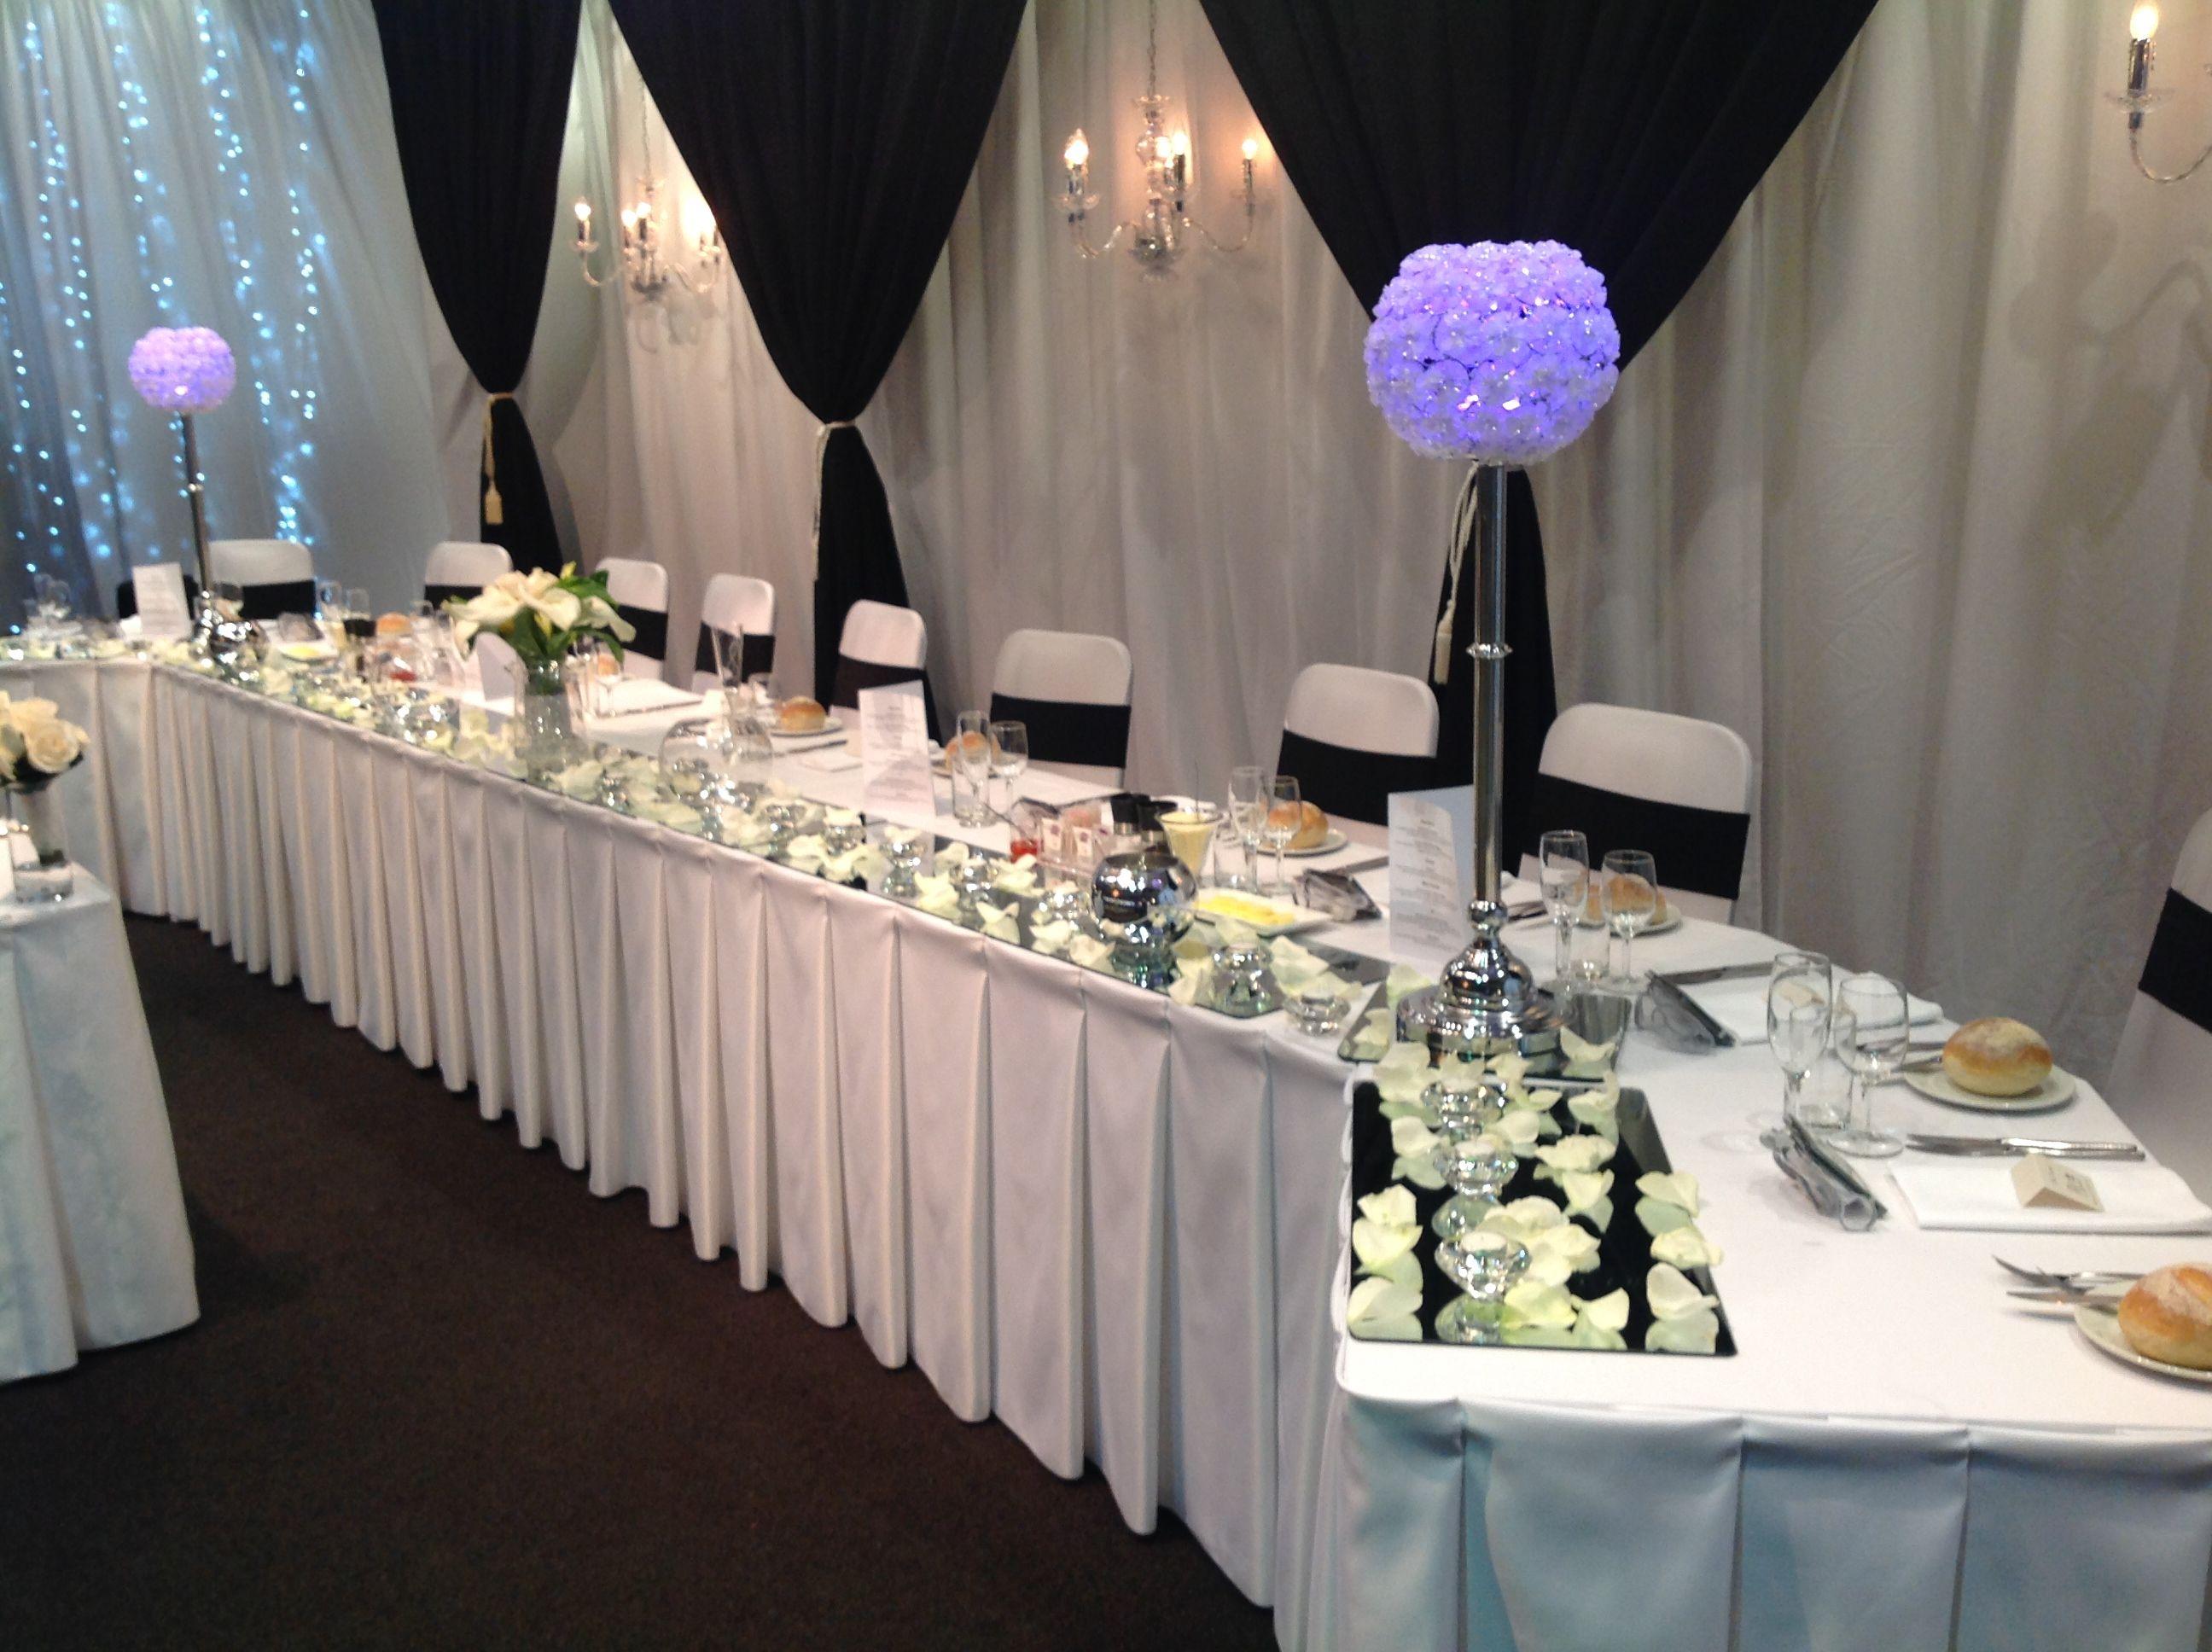 Bridal table decoration for adelaide wedding reception www bridal table decoration for adelaide wedding reception houseofthebride junglespirit Images